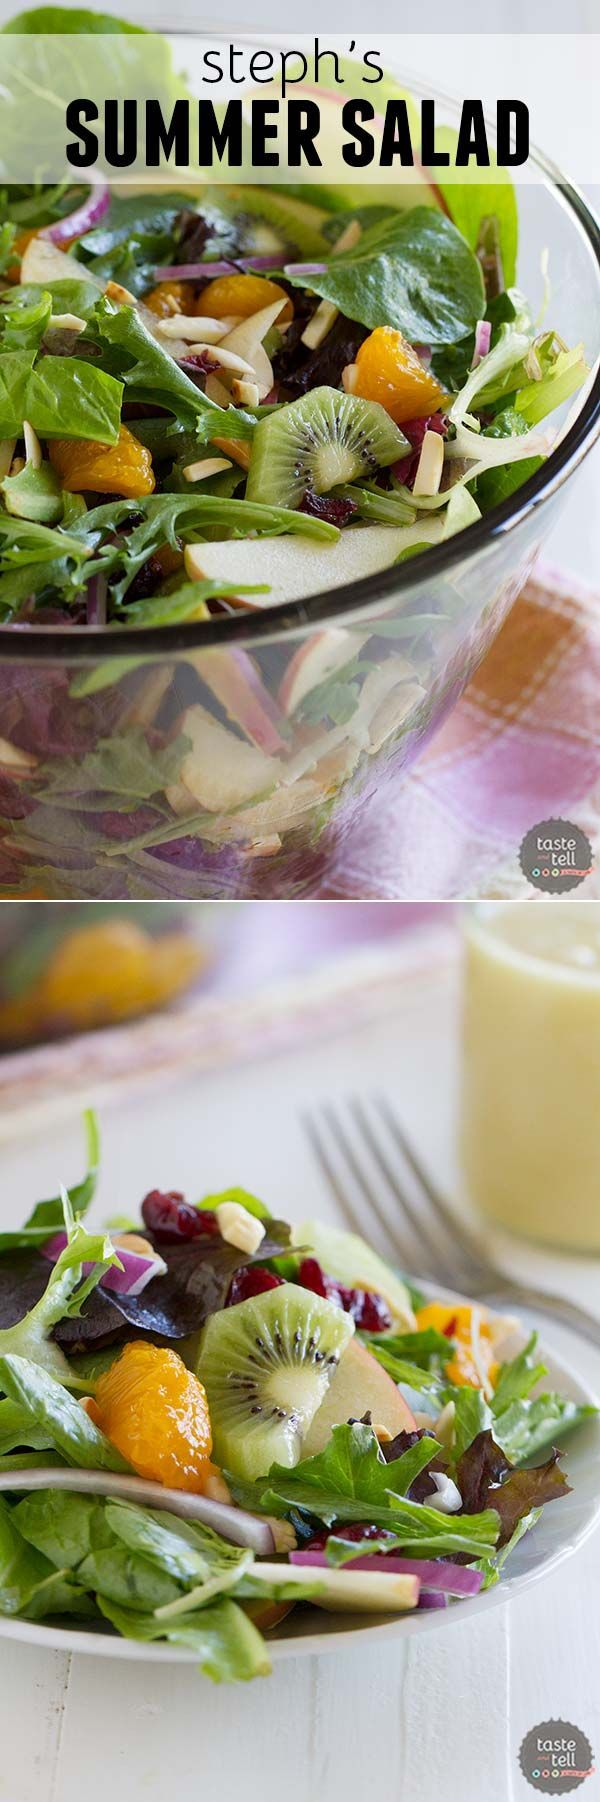 Steph's Summer Salad